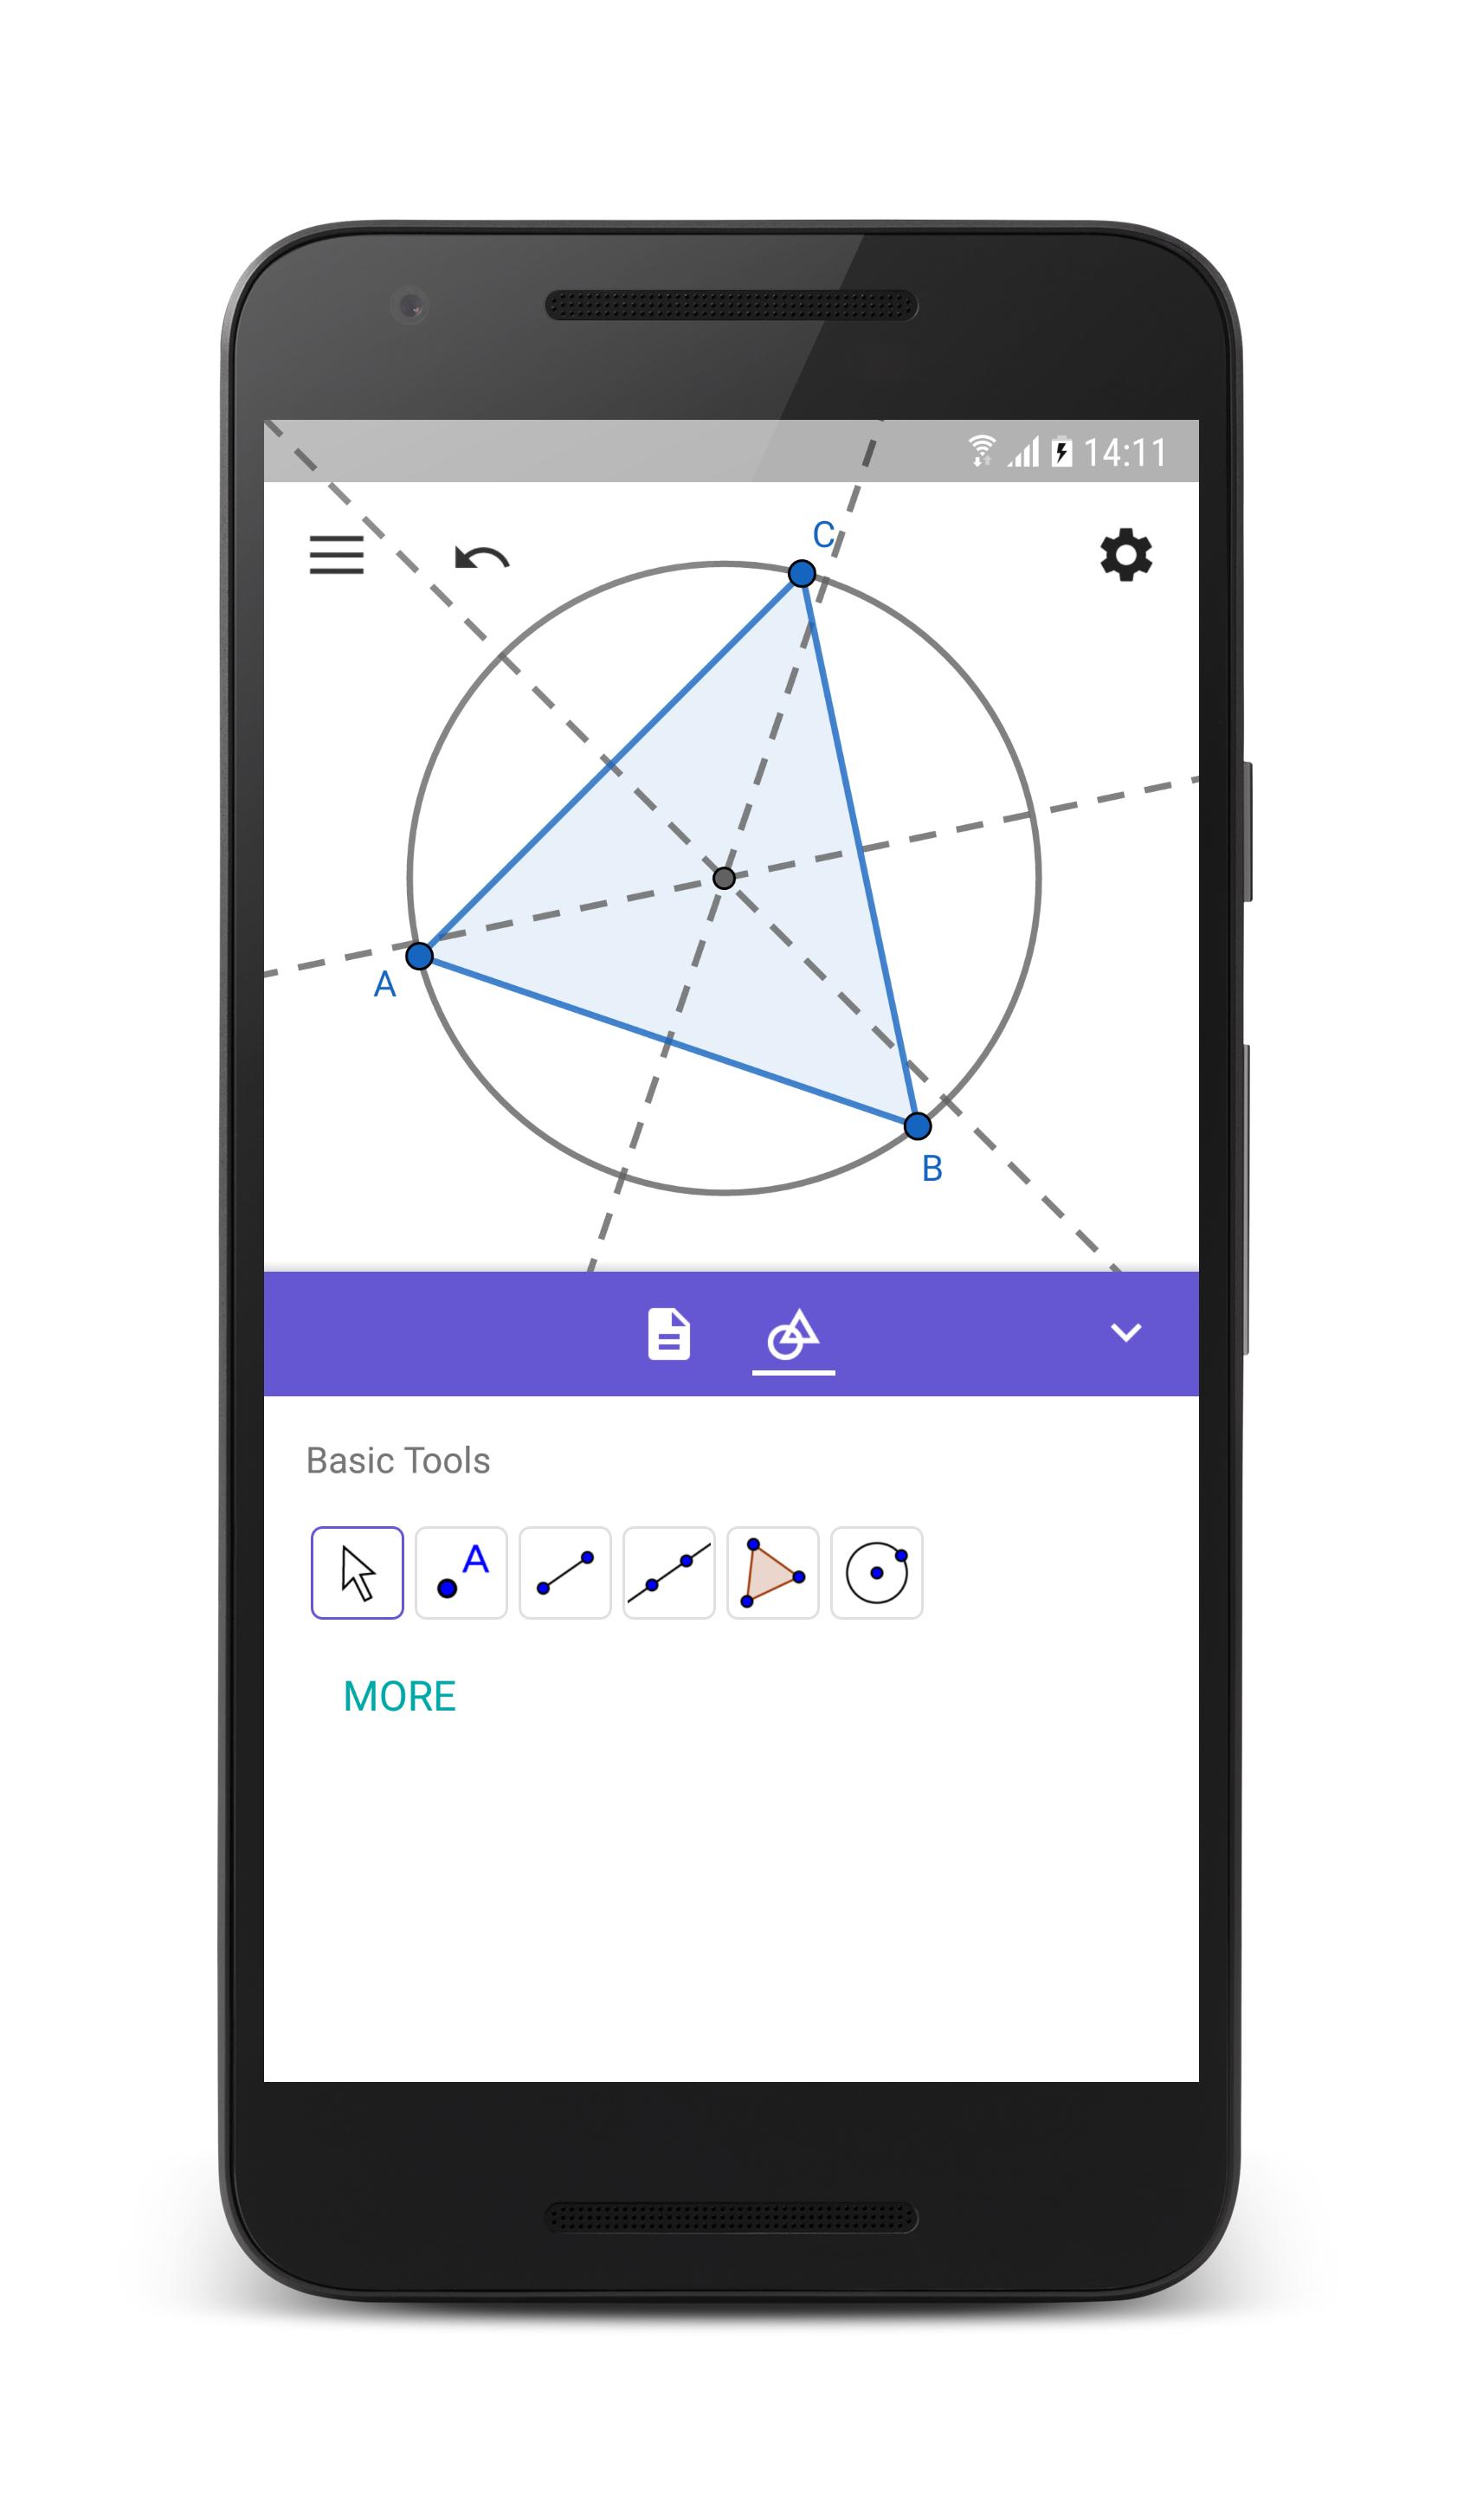 New GeoGebra Graphing Calculator and Geometry Apps | GeoGebra Blog